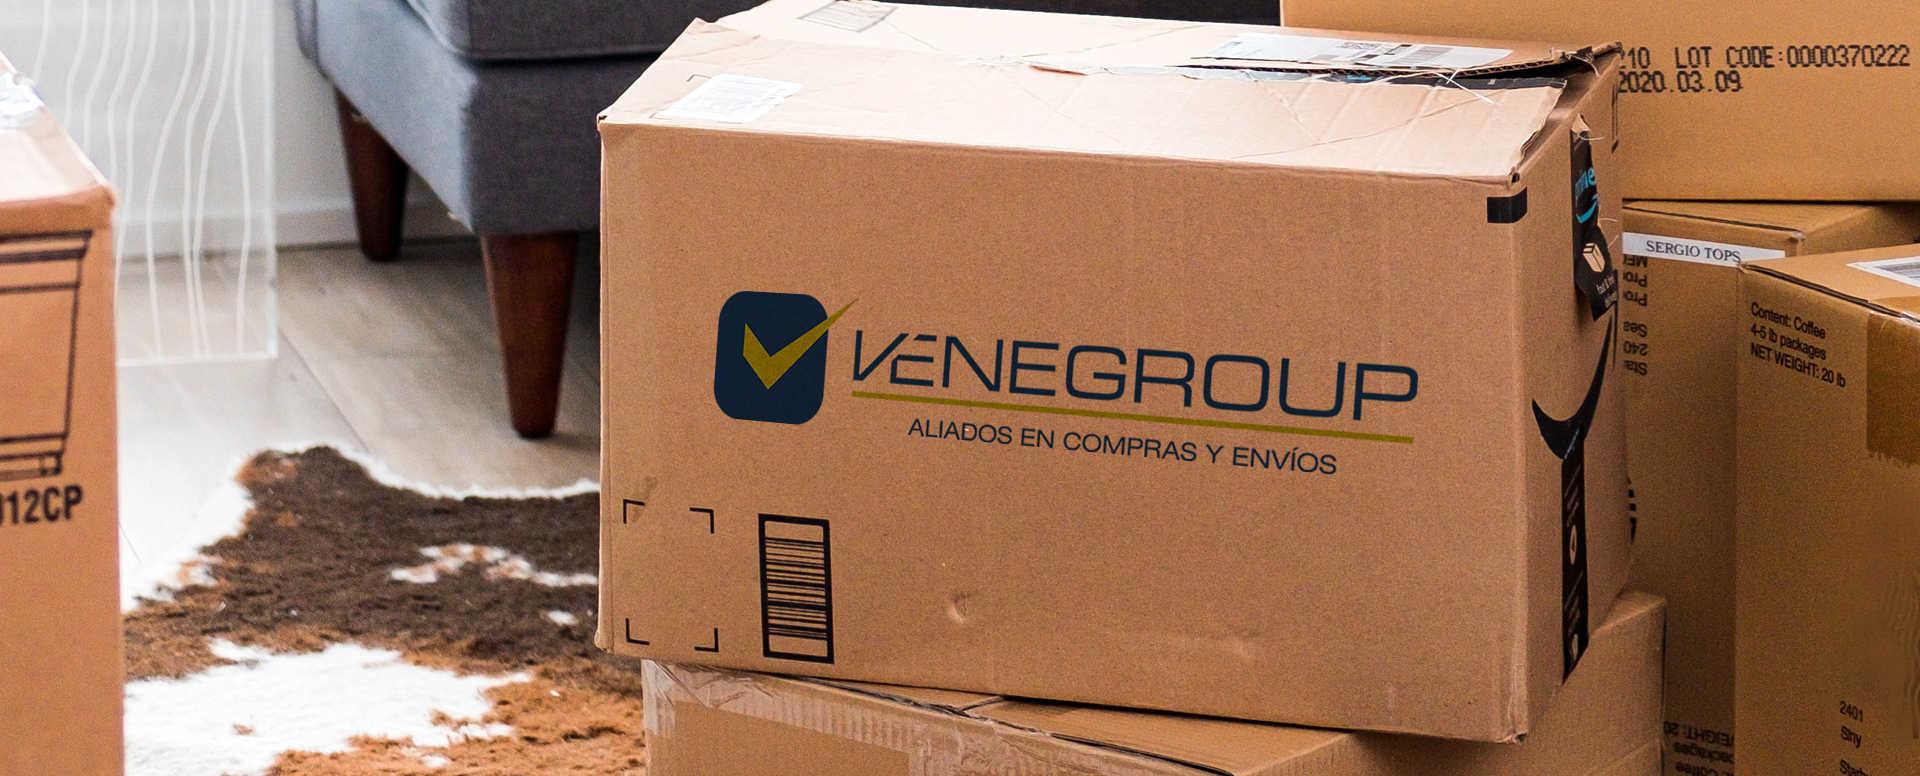 Venegroup